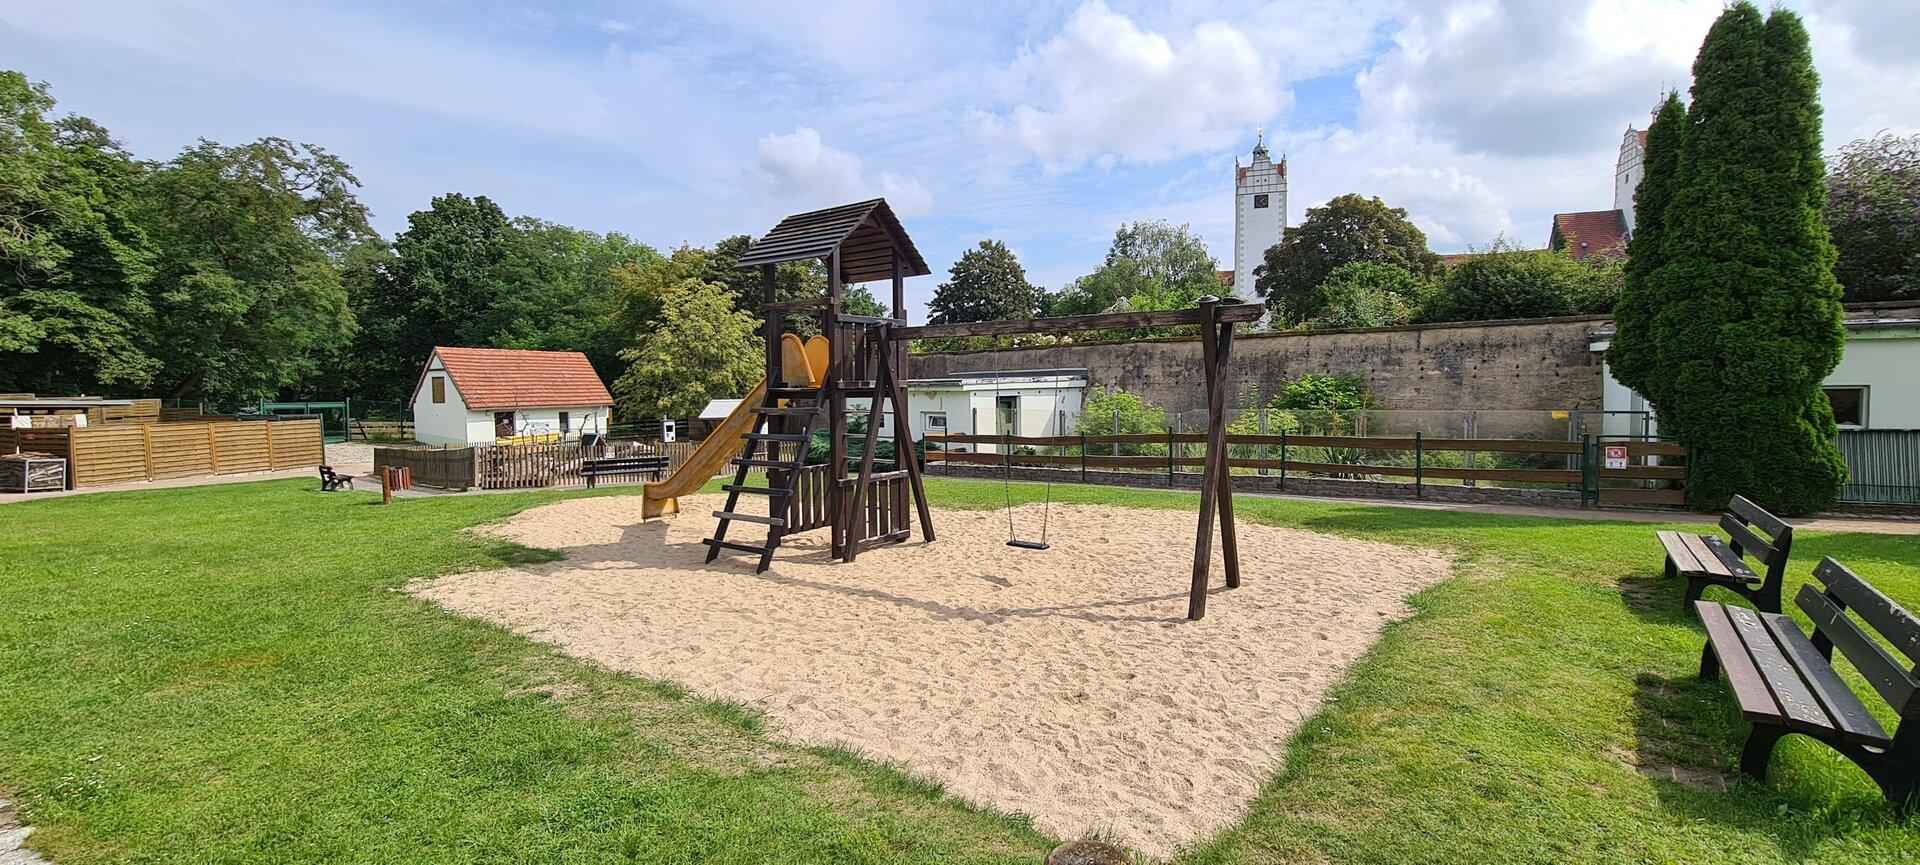 Spielplatz Tiergarten